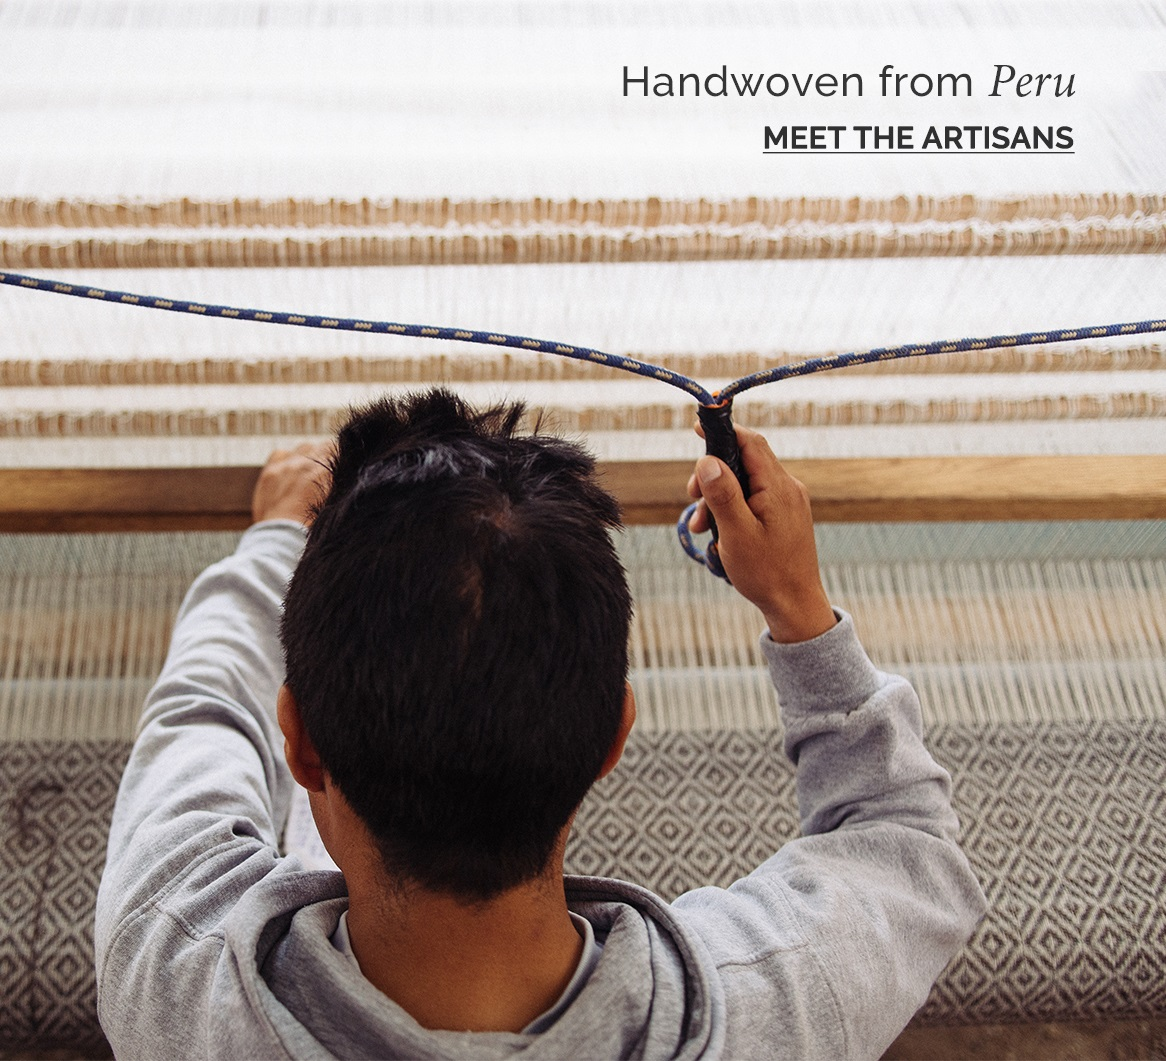 Handmade from Peru